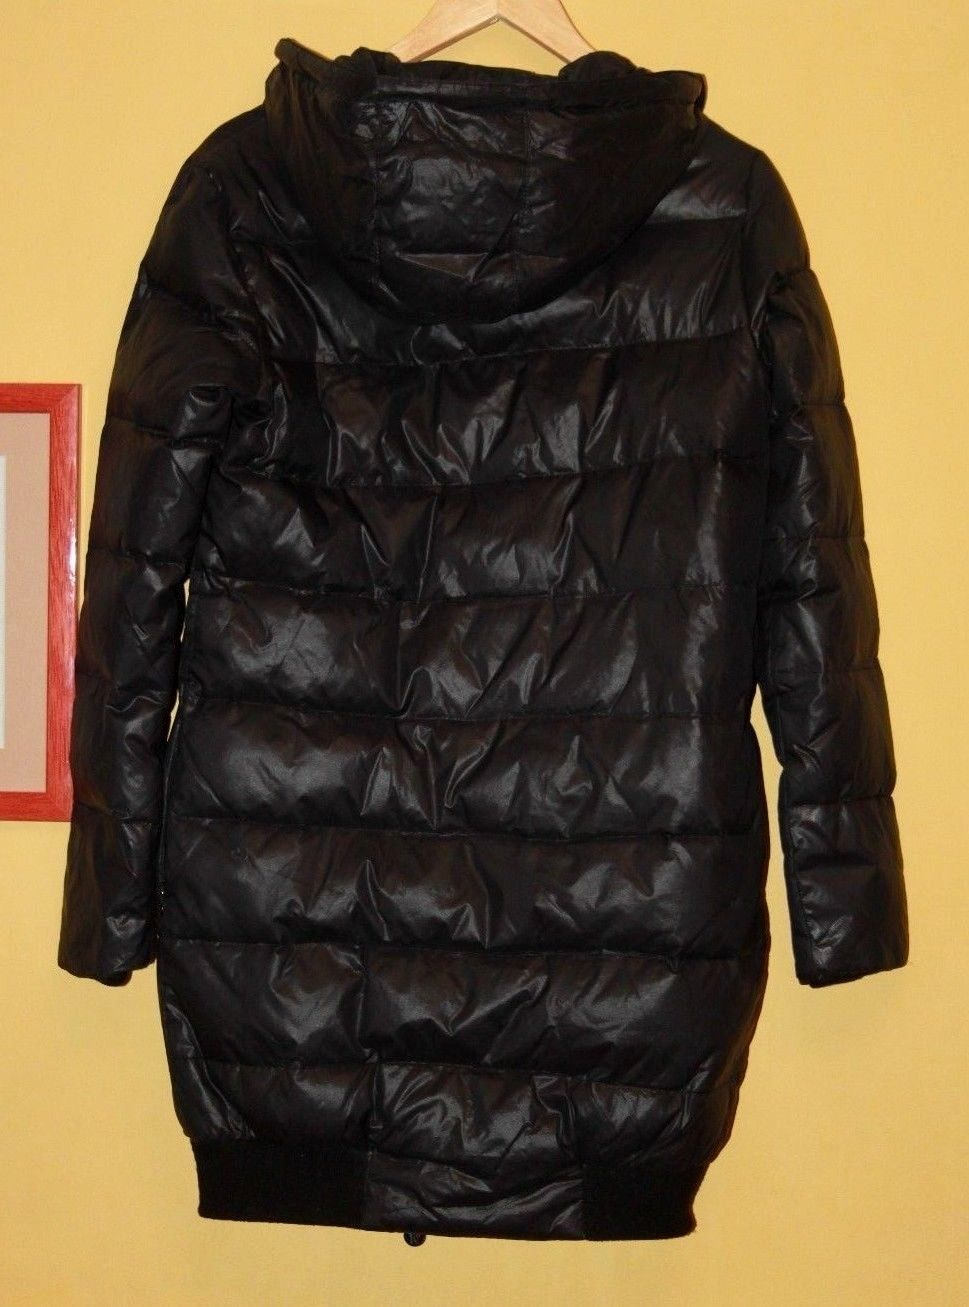 Moncler Pop Star Black Down Puffer Hooded Jacket Coat Size